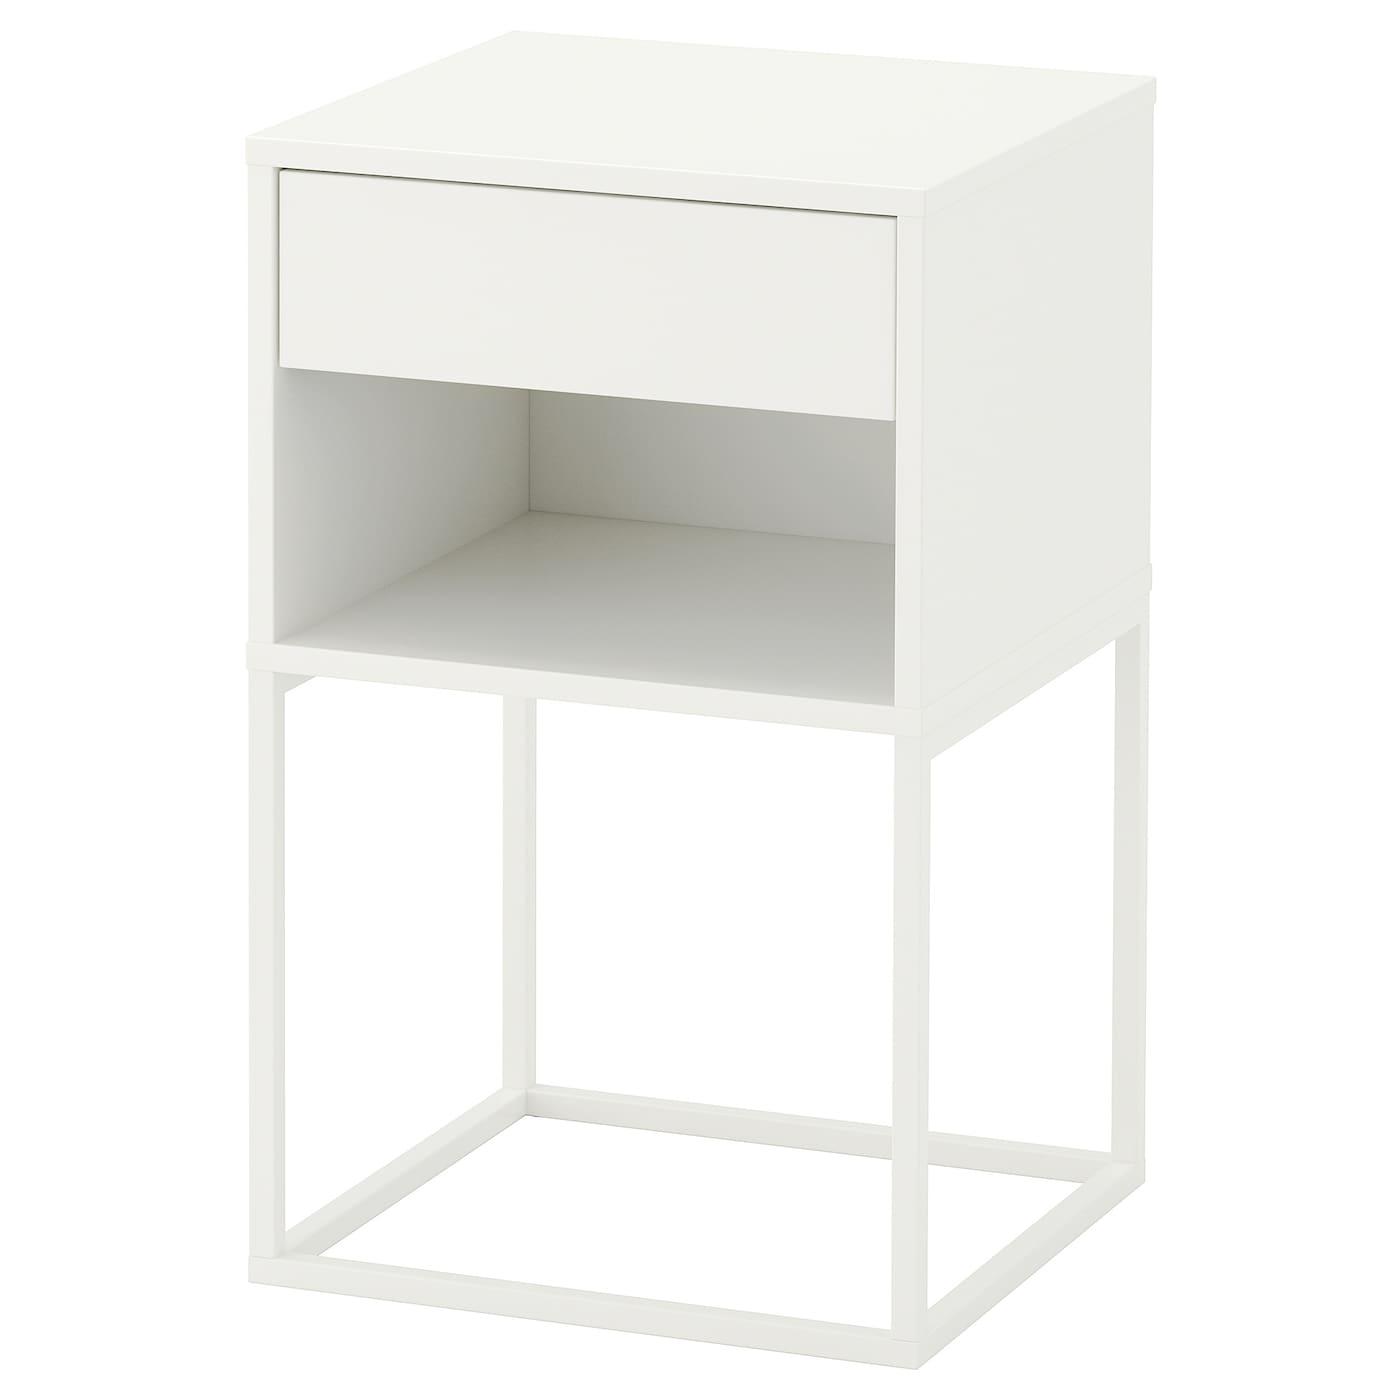 IKEA VIKHAMMER biały stolik nocny, 40x39 cm